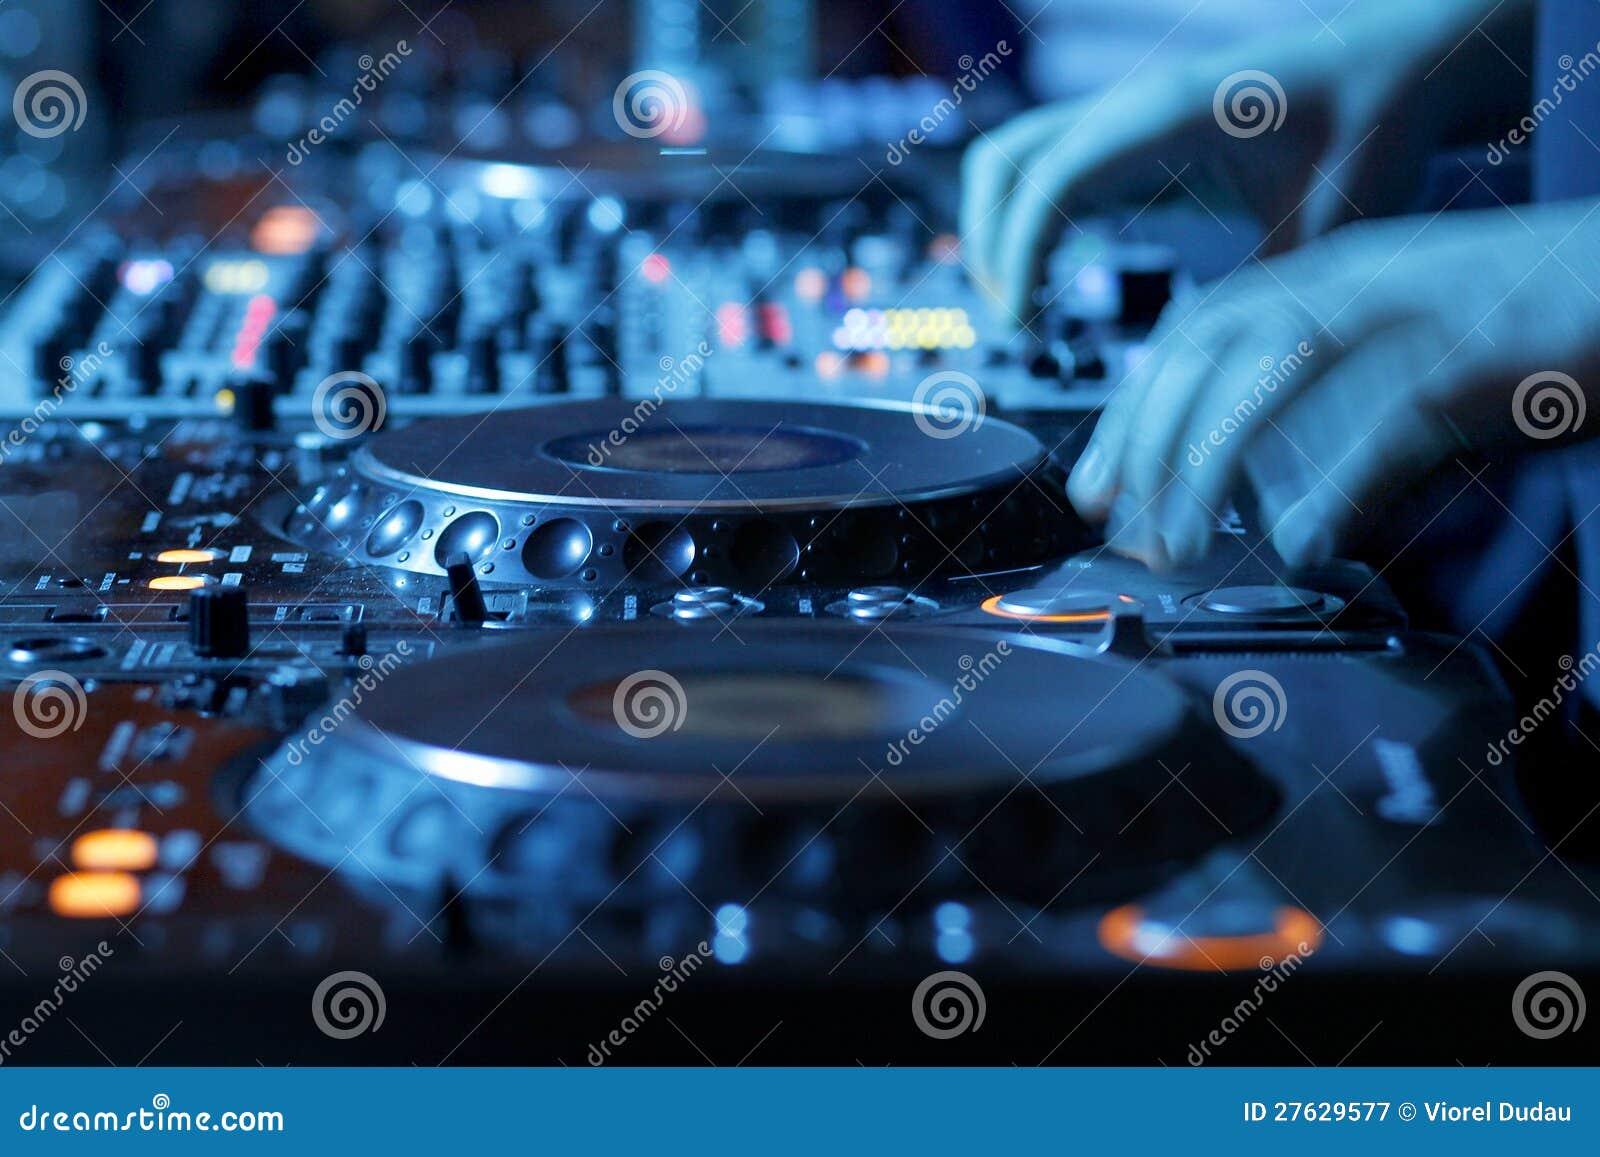 DJ mixing desk in nightclub